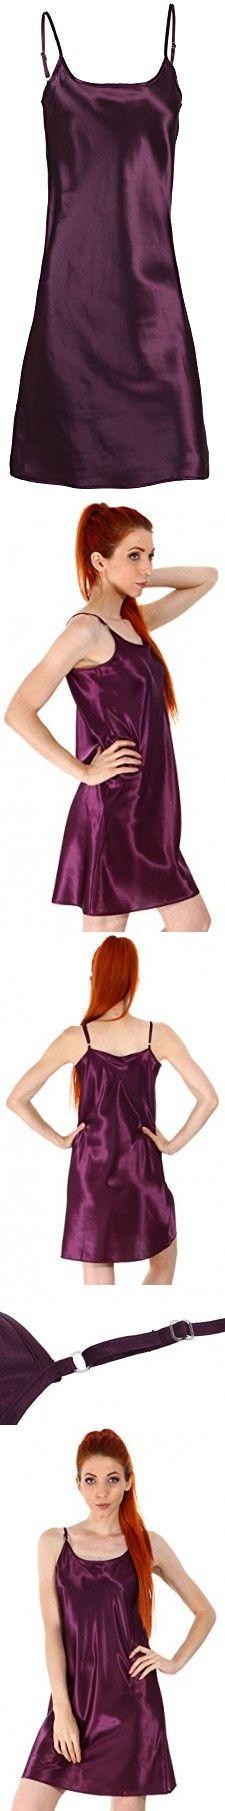 Women's Satin Nightgown, Long Camisole Chemise,Dark Purple, S/M